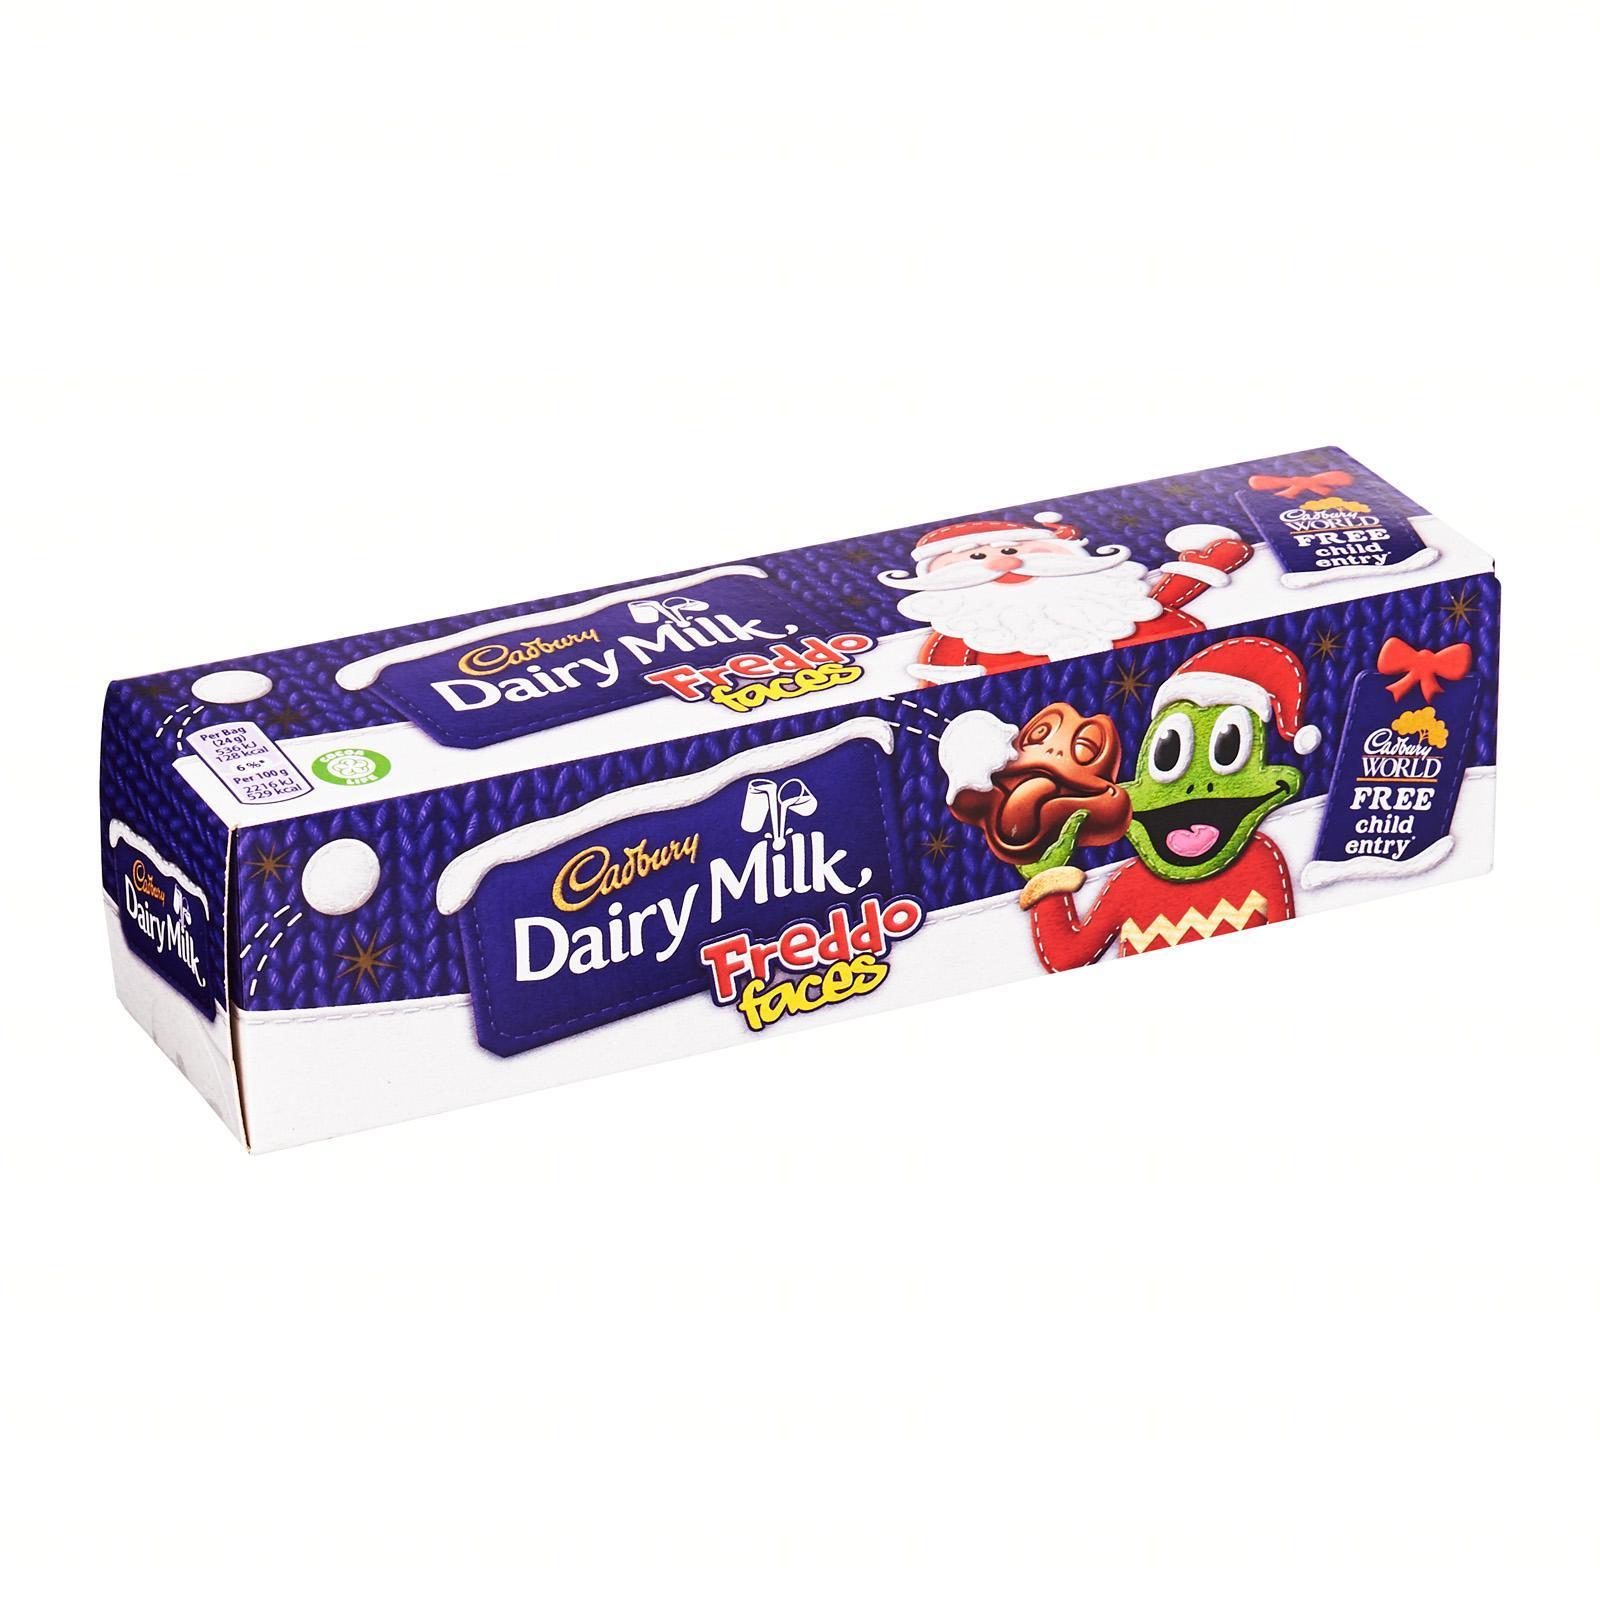 Cadbury Dairy Milk Chocolate Freddo Faces Tube - Christmas Special